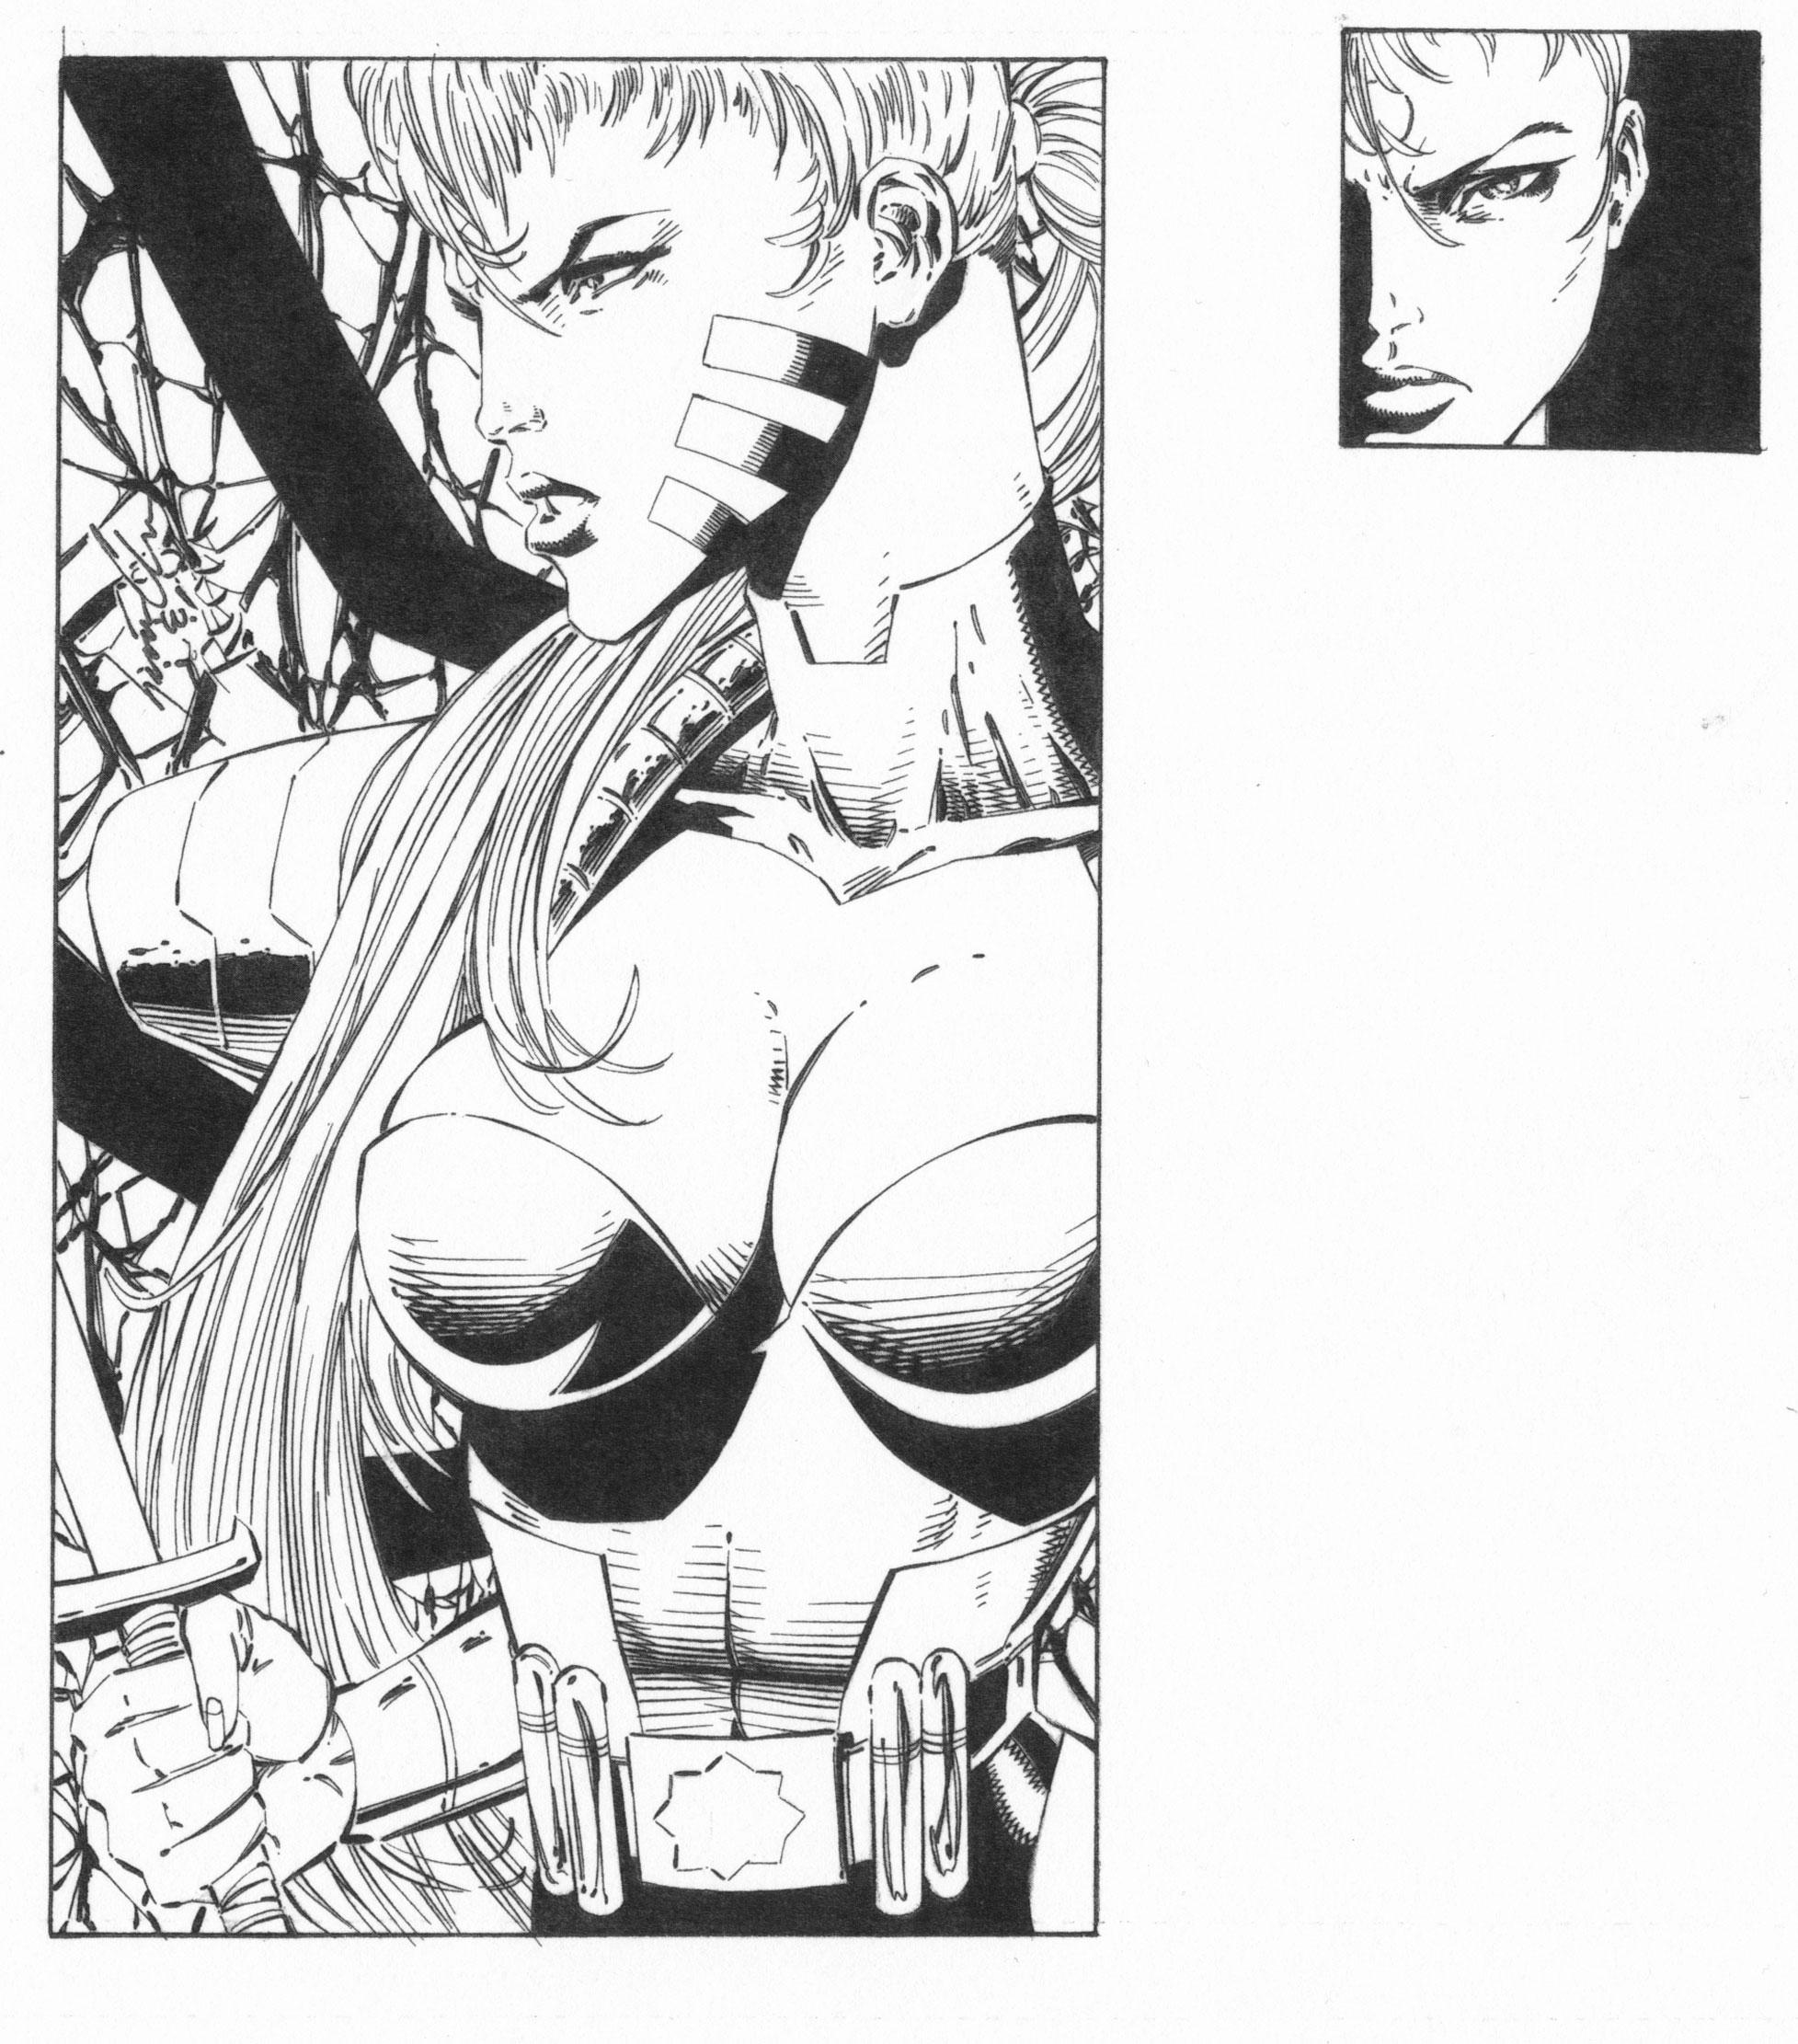 SCOTT CLARK 1994 ZEALOT TRADING CARD ART Comic Art